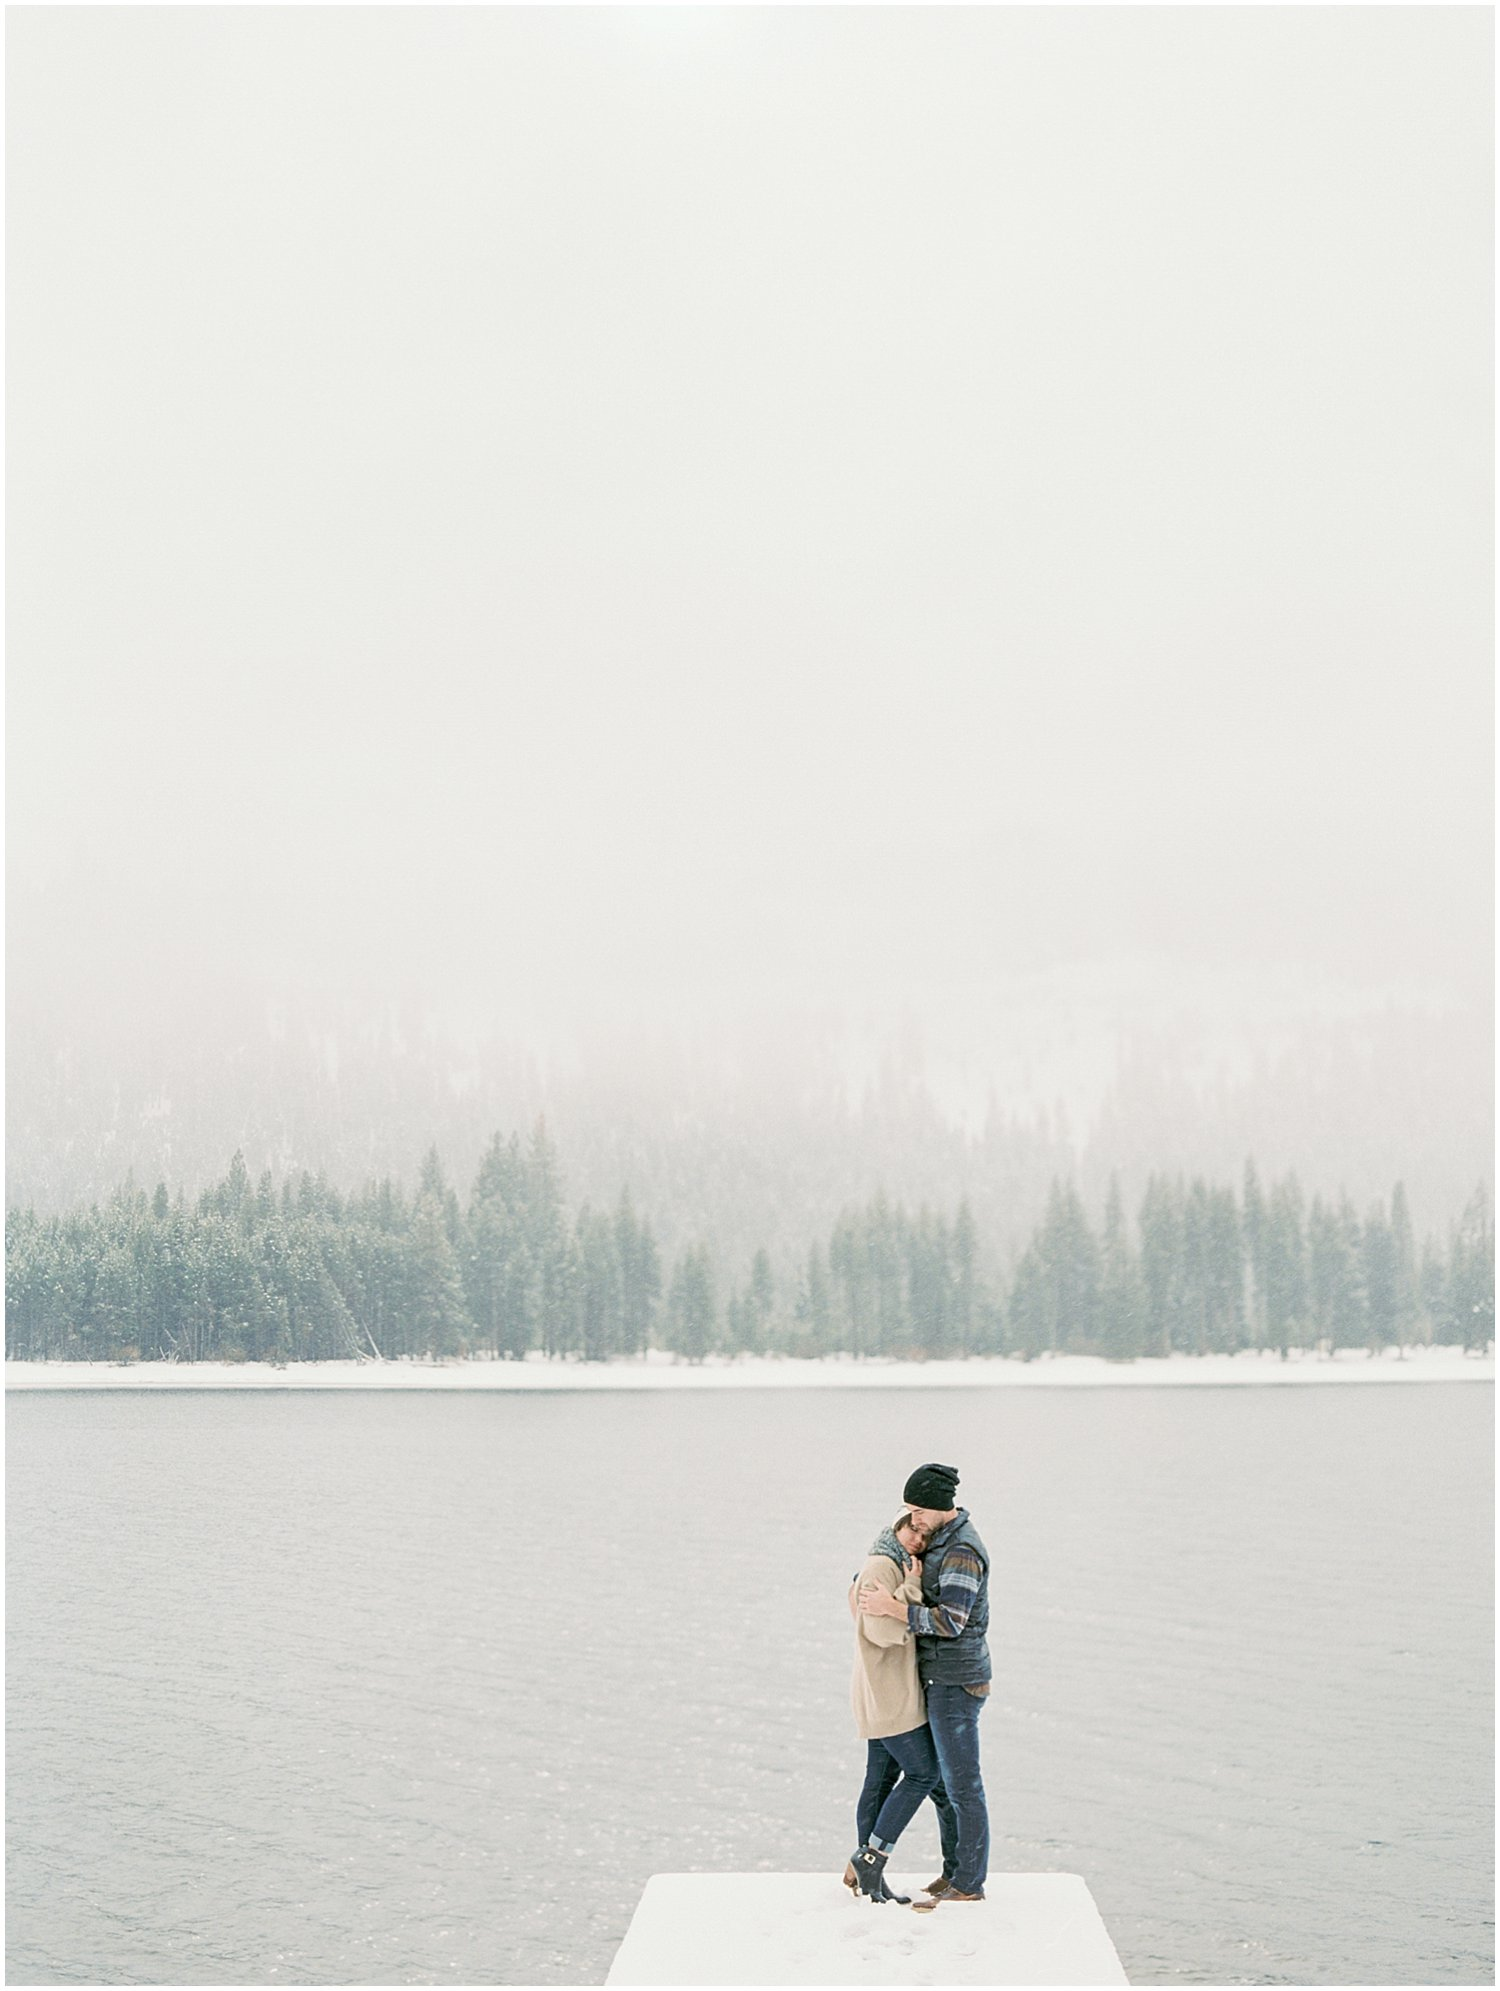 Lake_Tahoe_Engagement_Photography_12.jpg